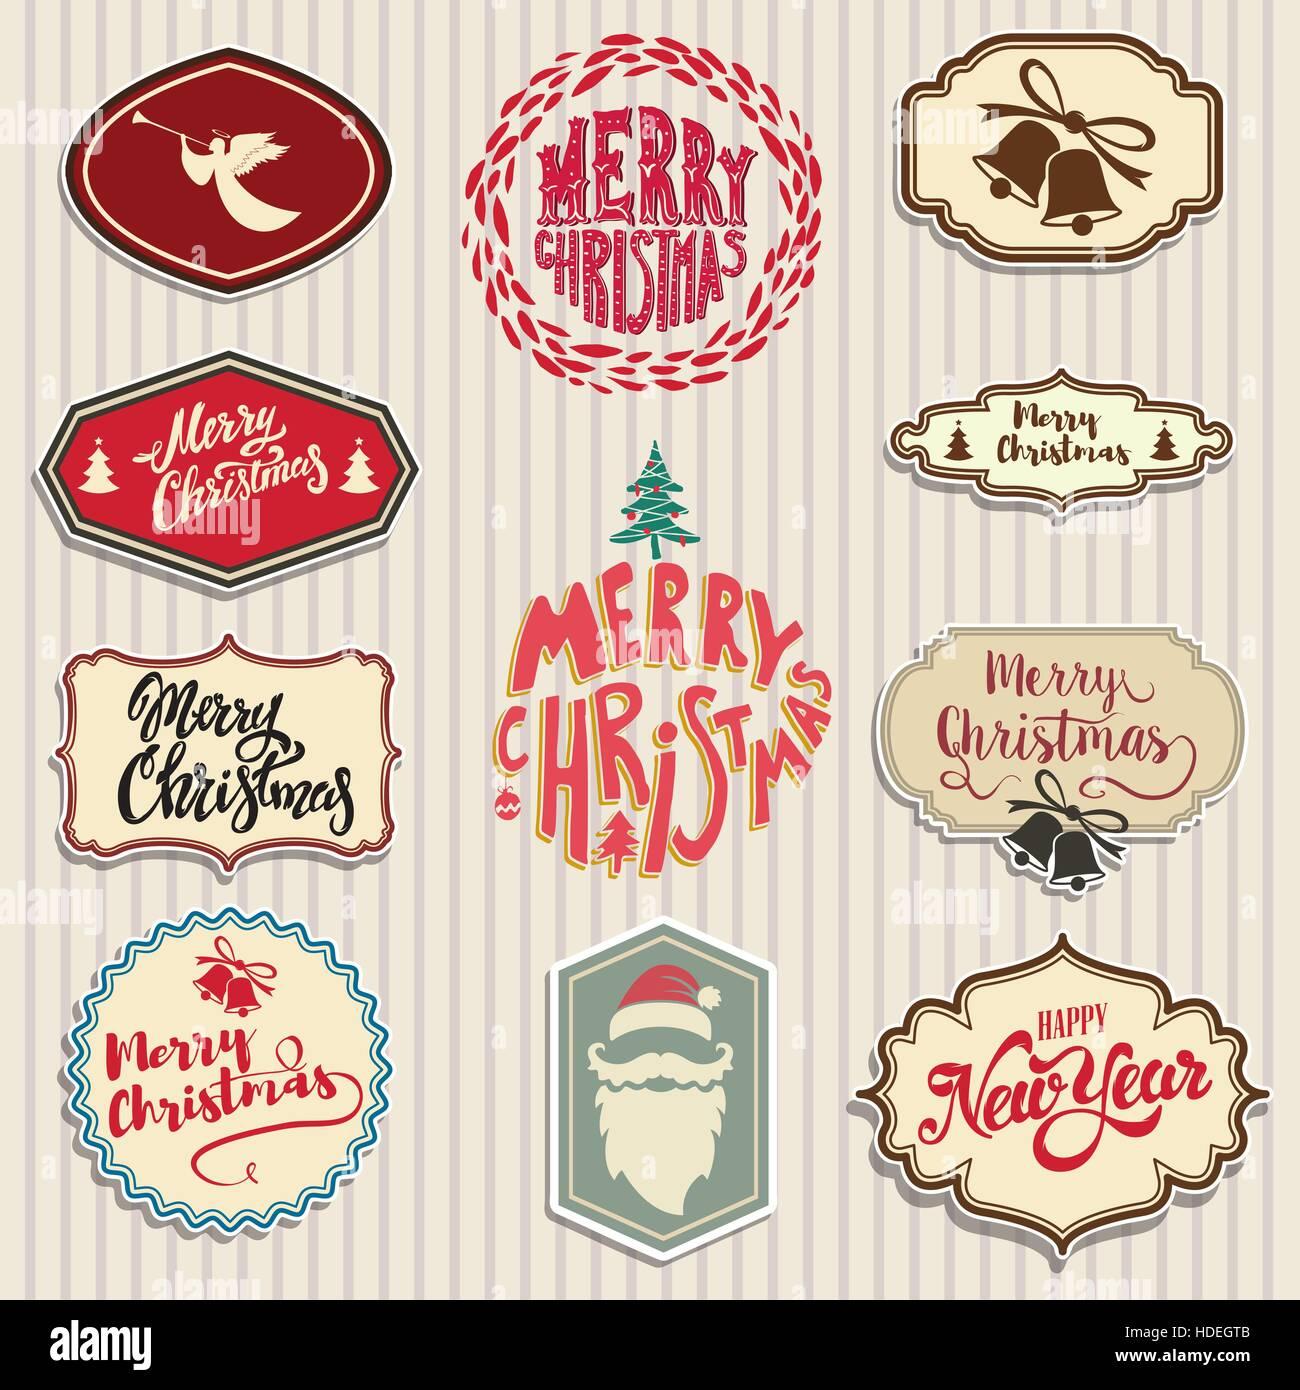 Christmas emblems set santa claus beard angel bells design stock christmas emblems set santa claus beard angel bells design elements for poster greeting cards vector illustration kristyandbryce Choice Image